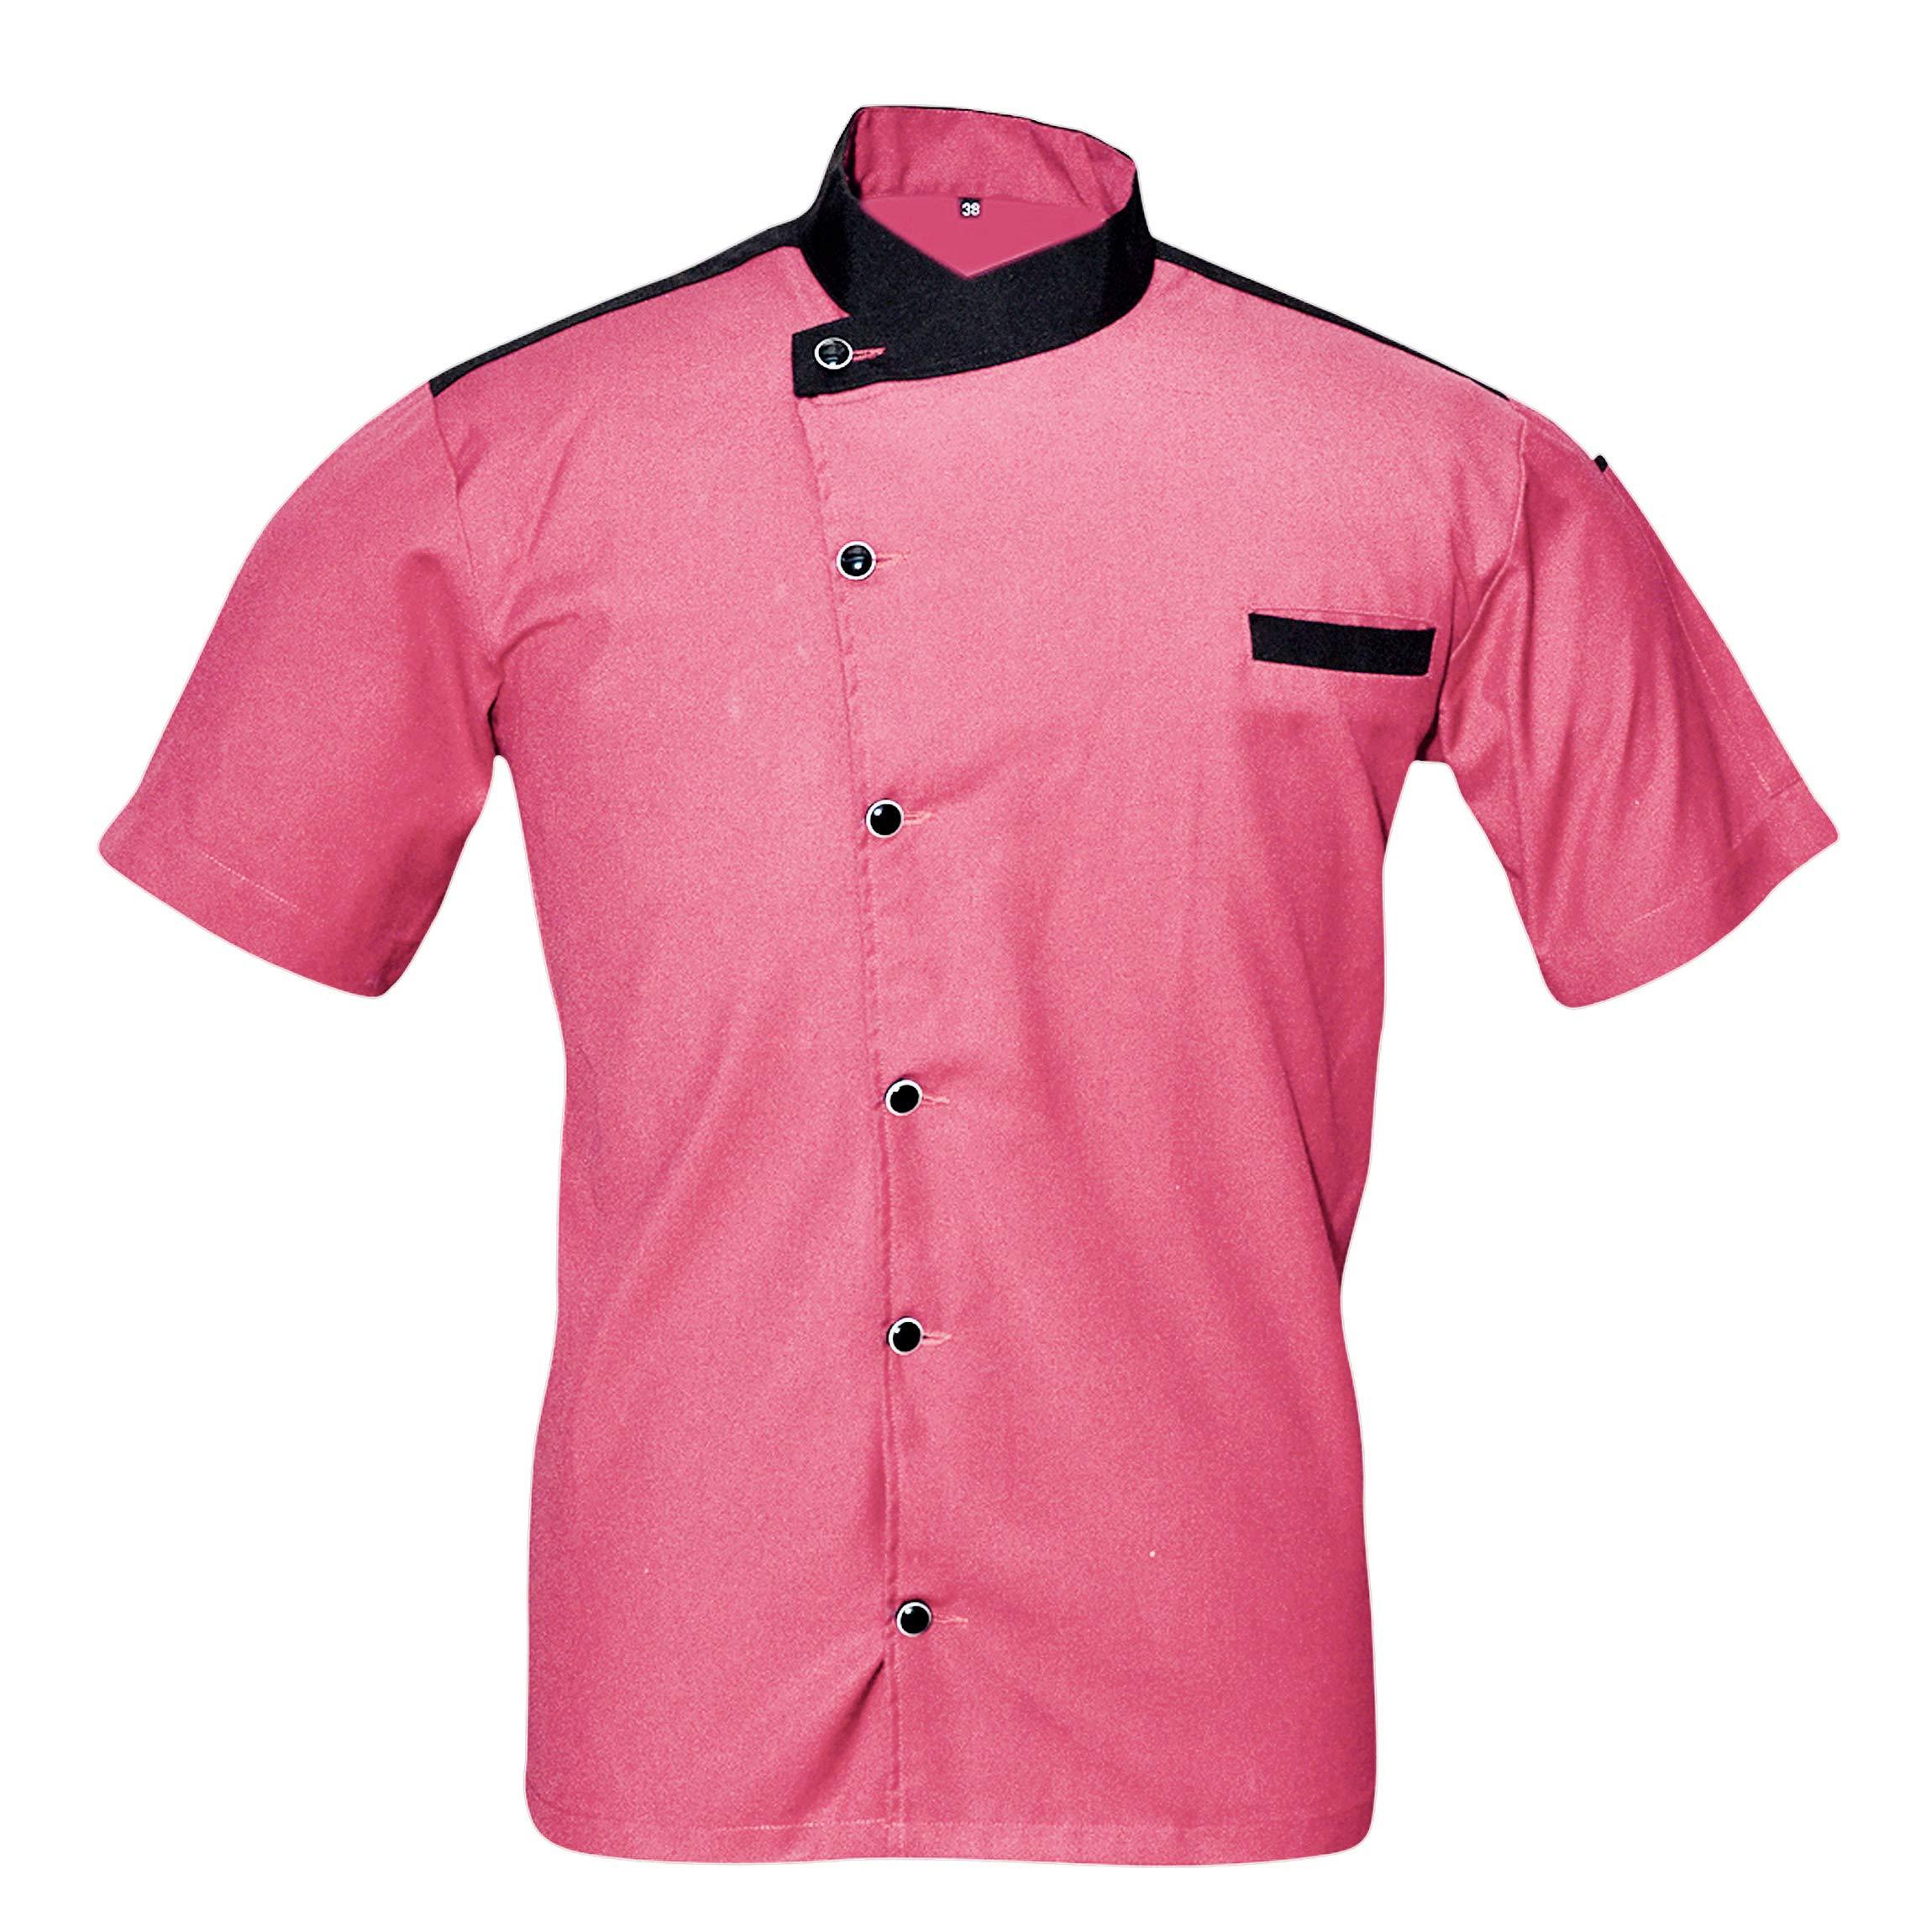 Leorenzo Creation LC-55 Men's Chef Coat (Size- L, Pink Colour)